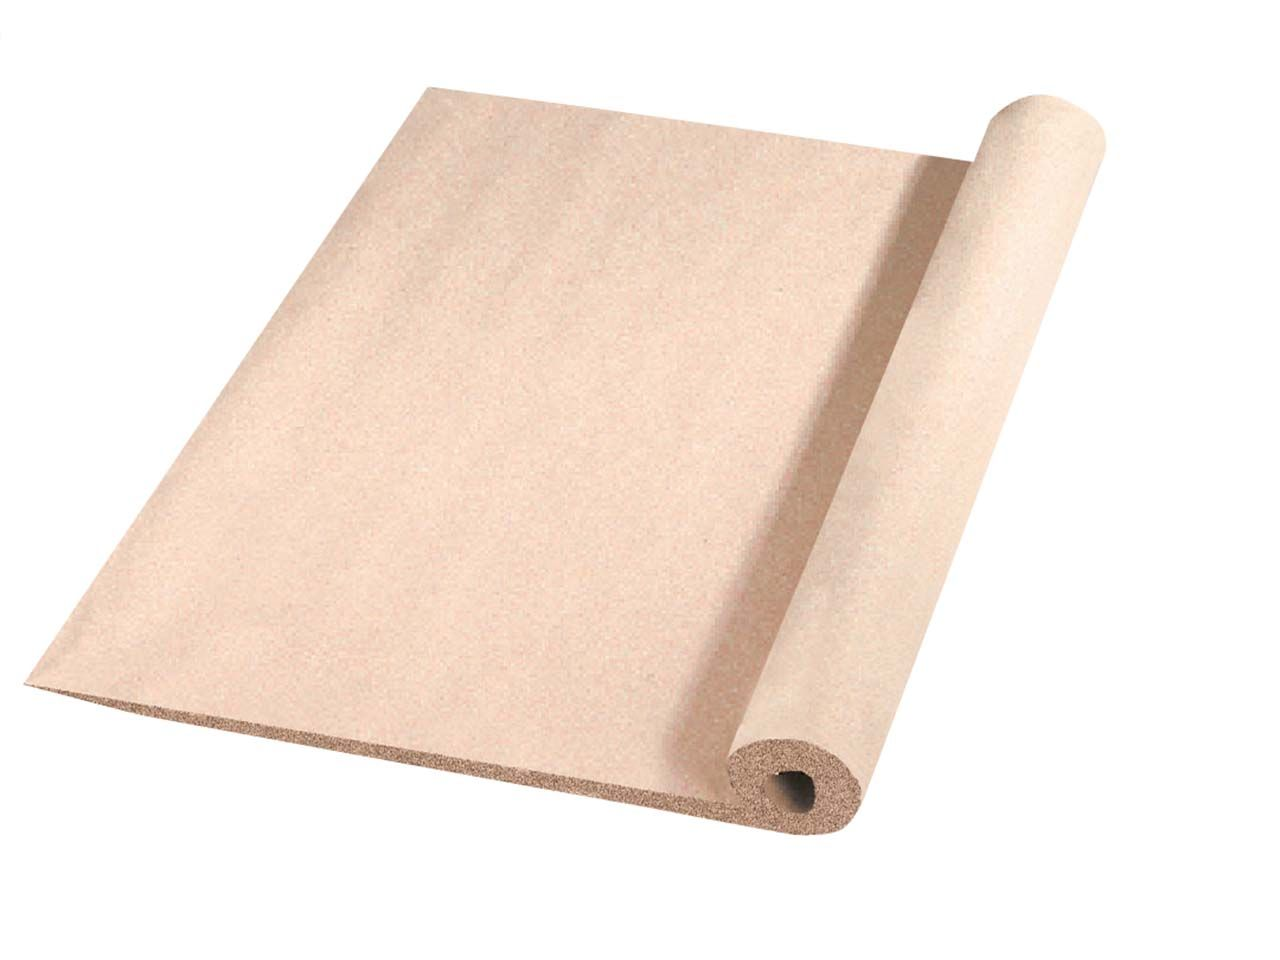 50 Blatt Pinnwandpapier im Karton, 80 g 88026348